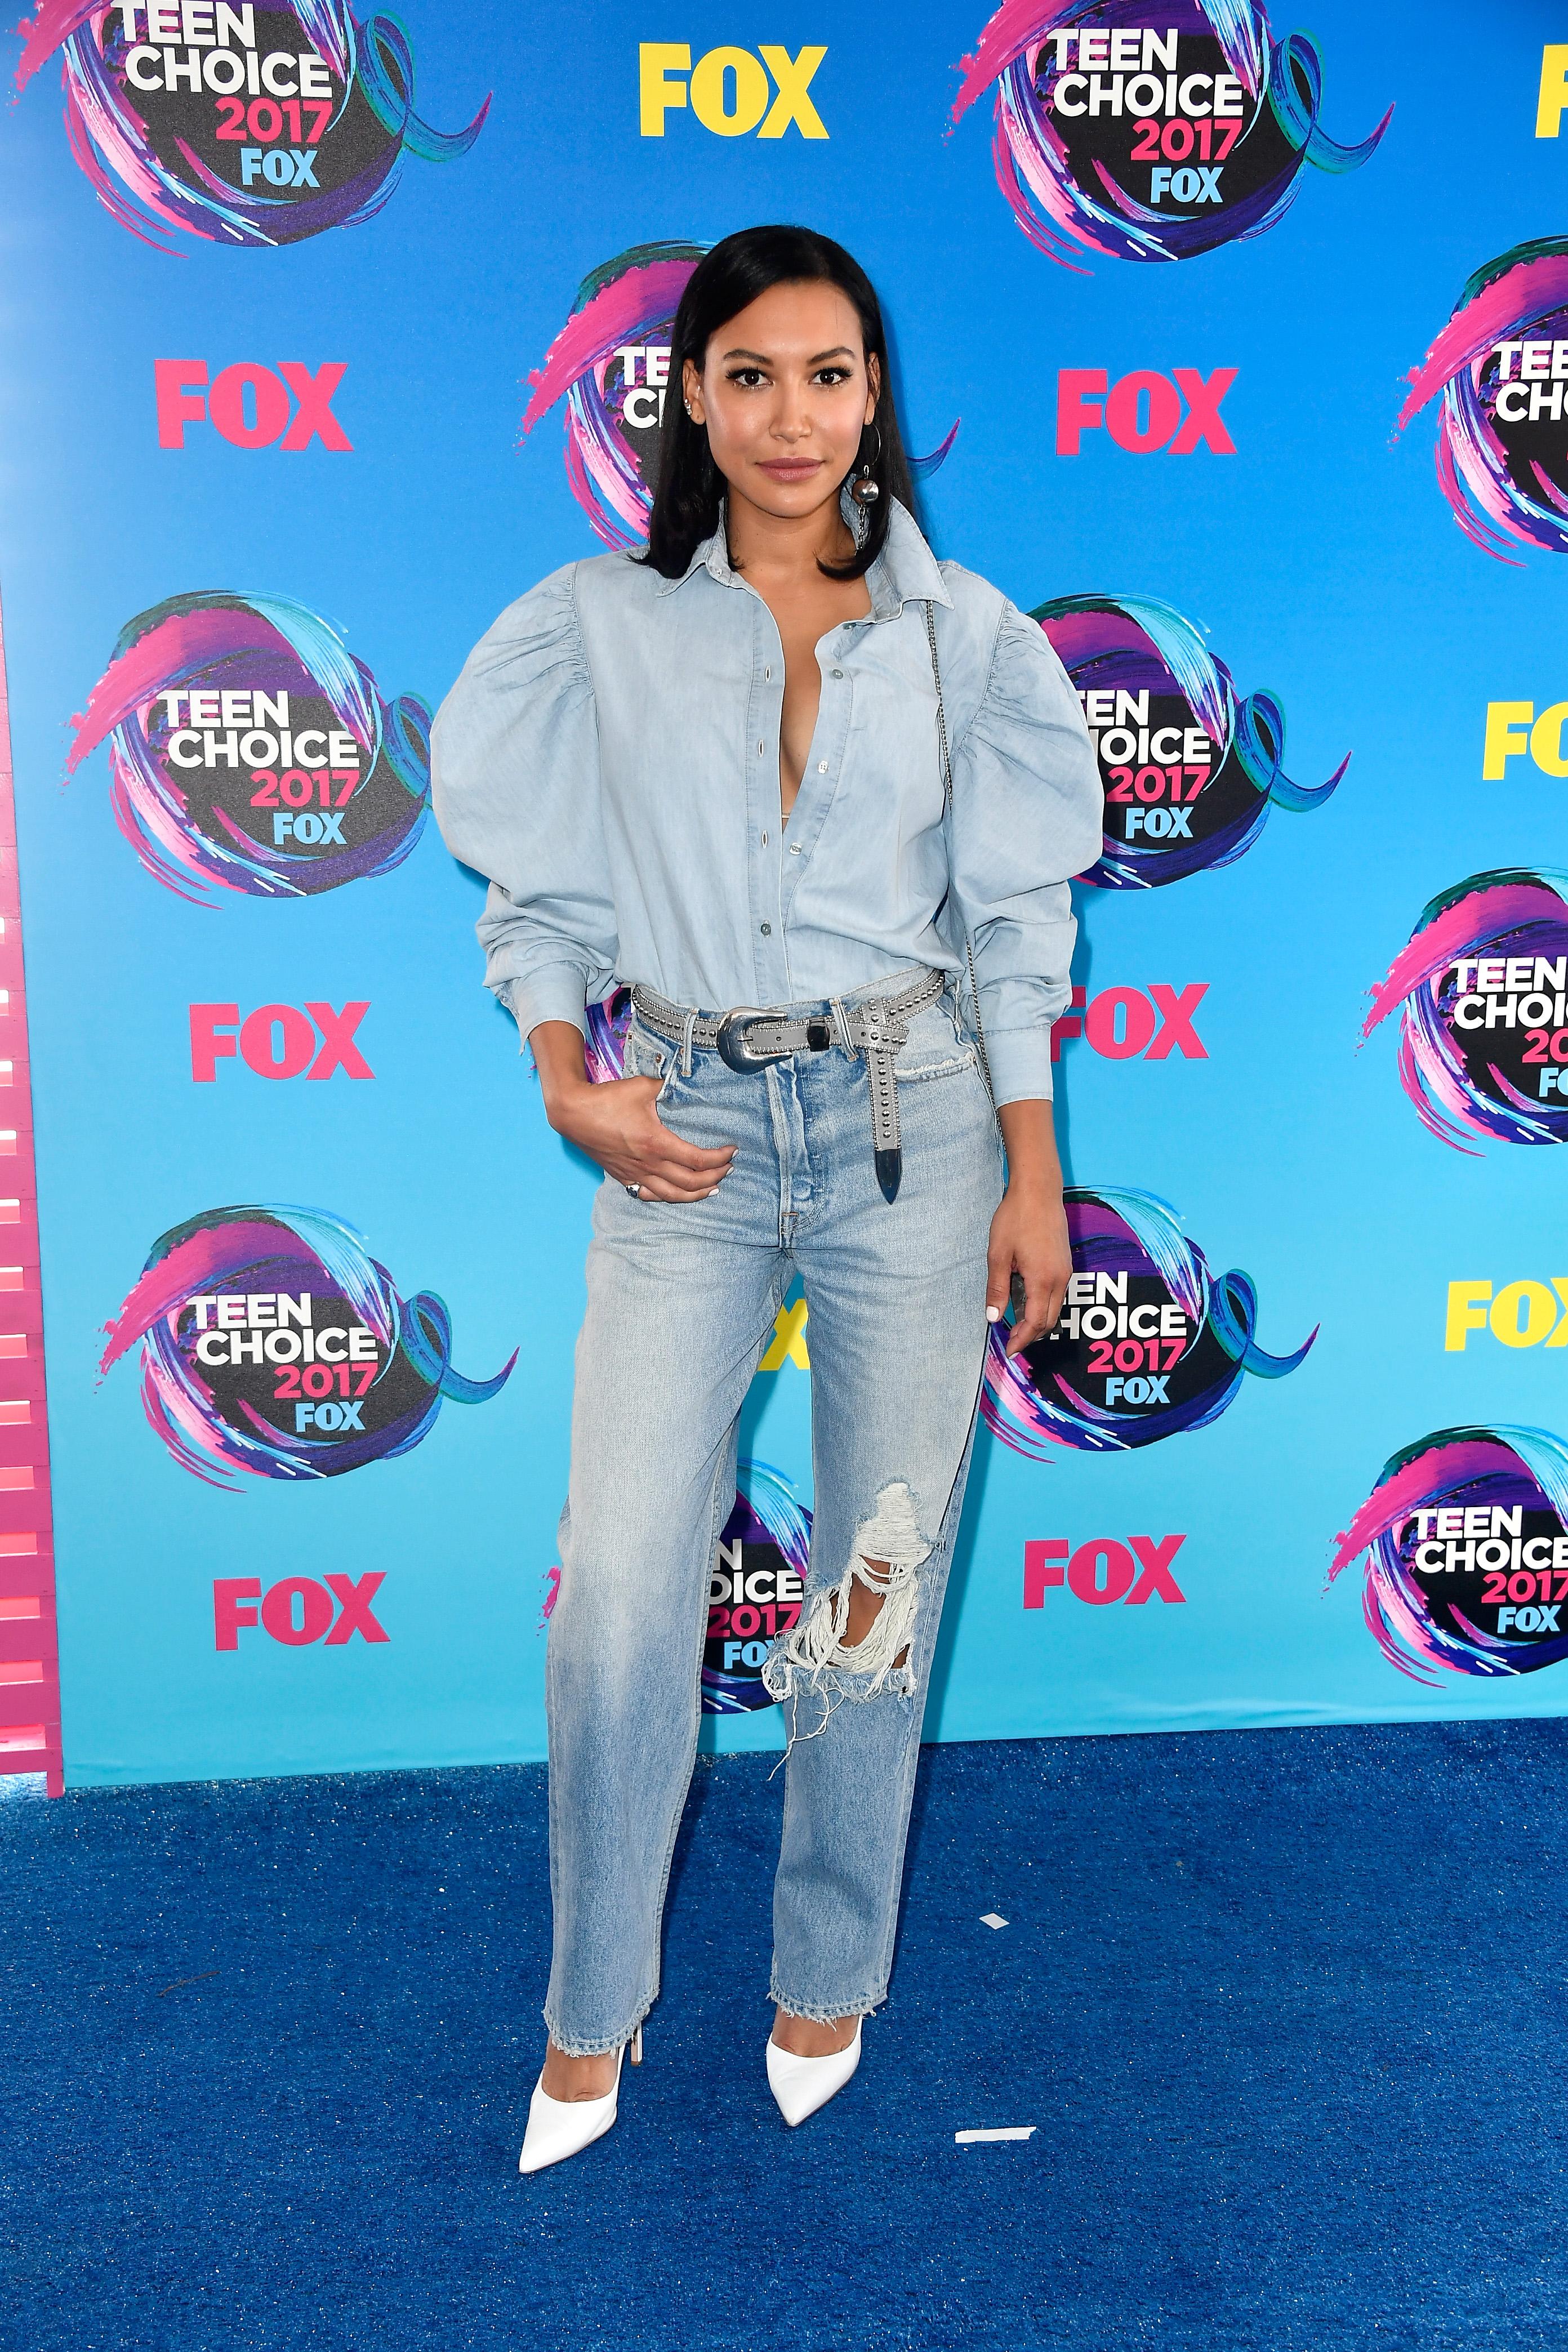 Teen Choice Awards 2017 - Naya Rivera